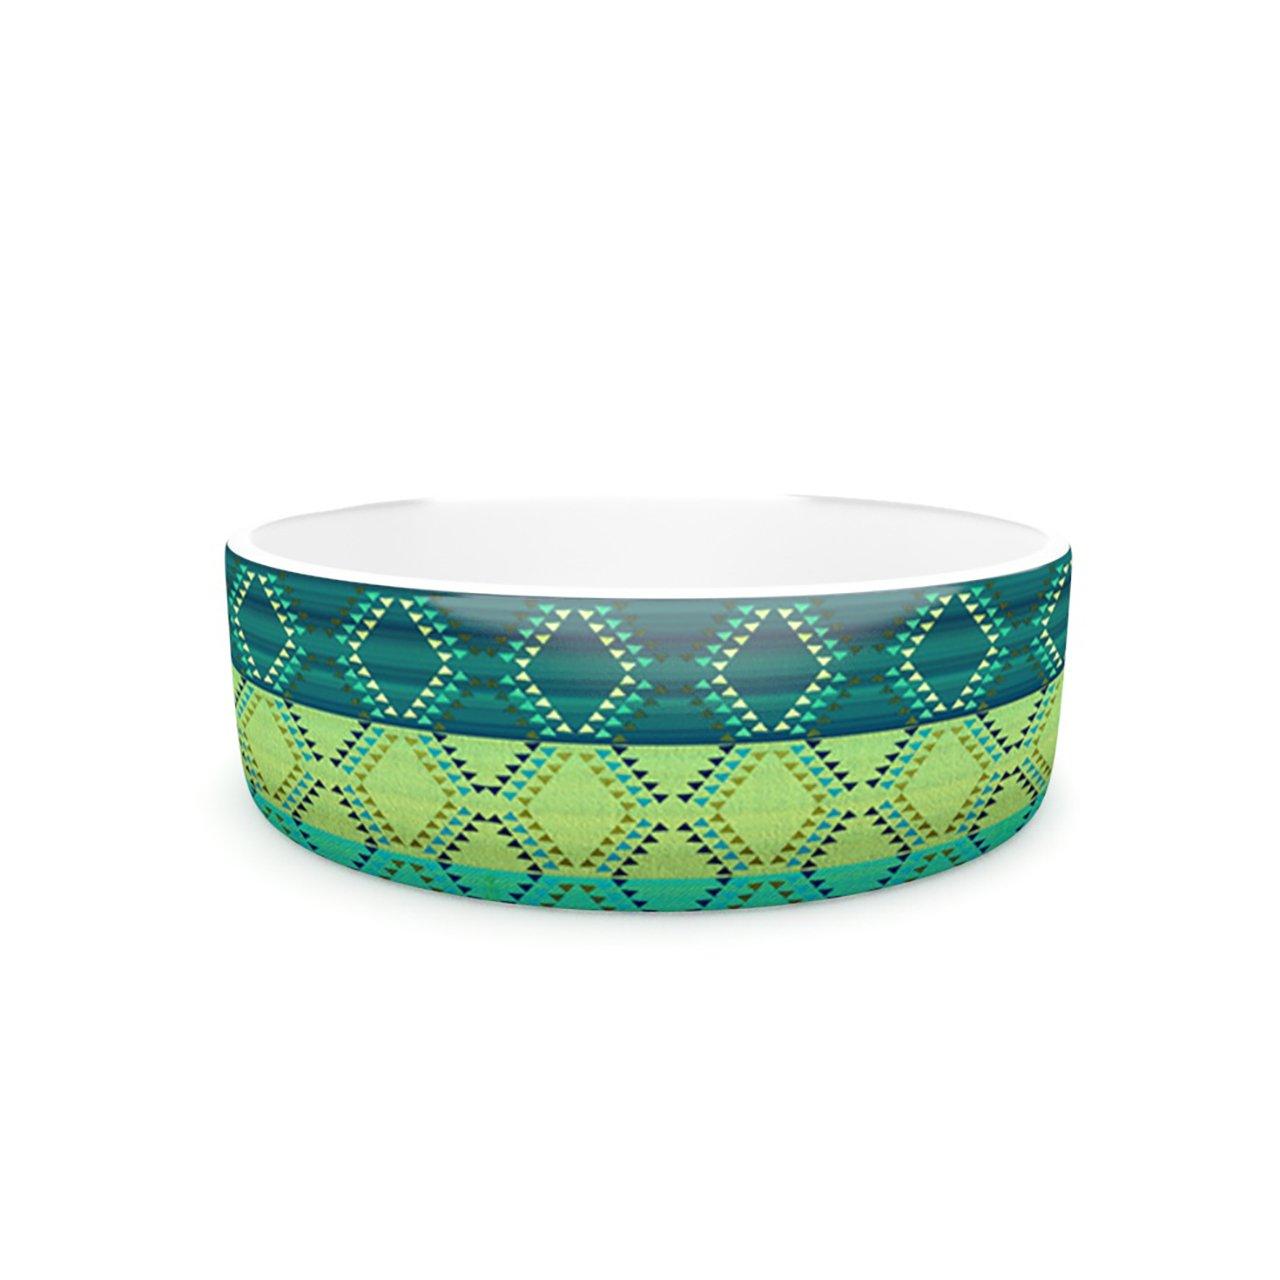 Kess InHouse Nina May Denin Diamond Gradient Green  Pet Bowl, 7-Inch, Turquoise Emerald